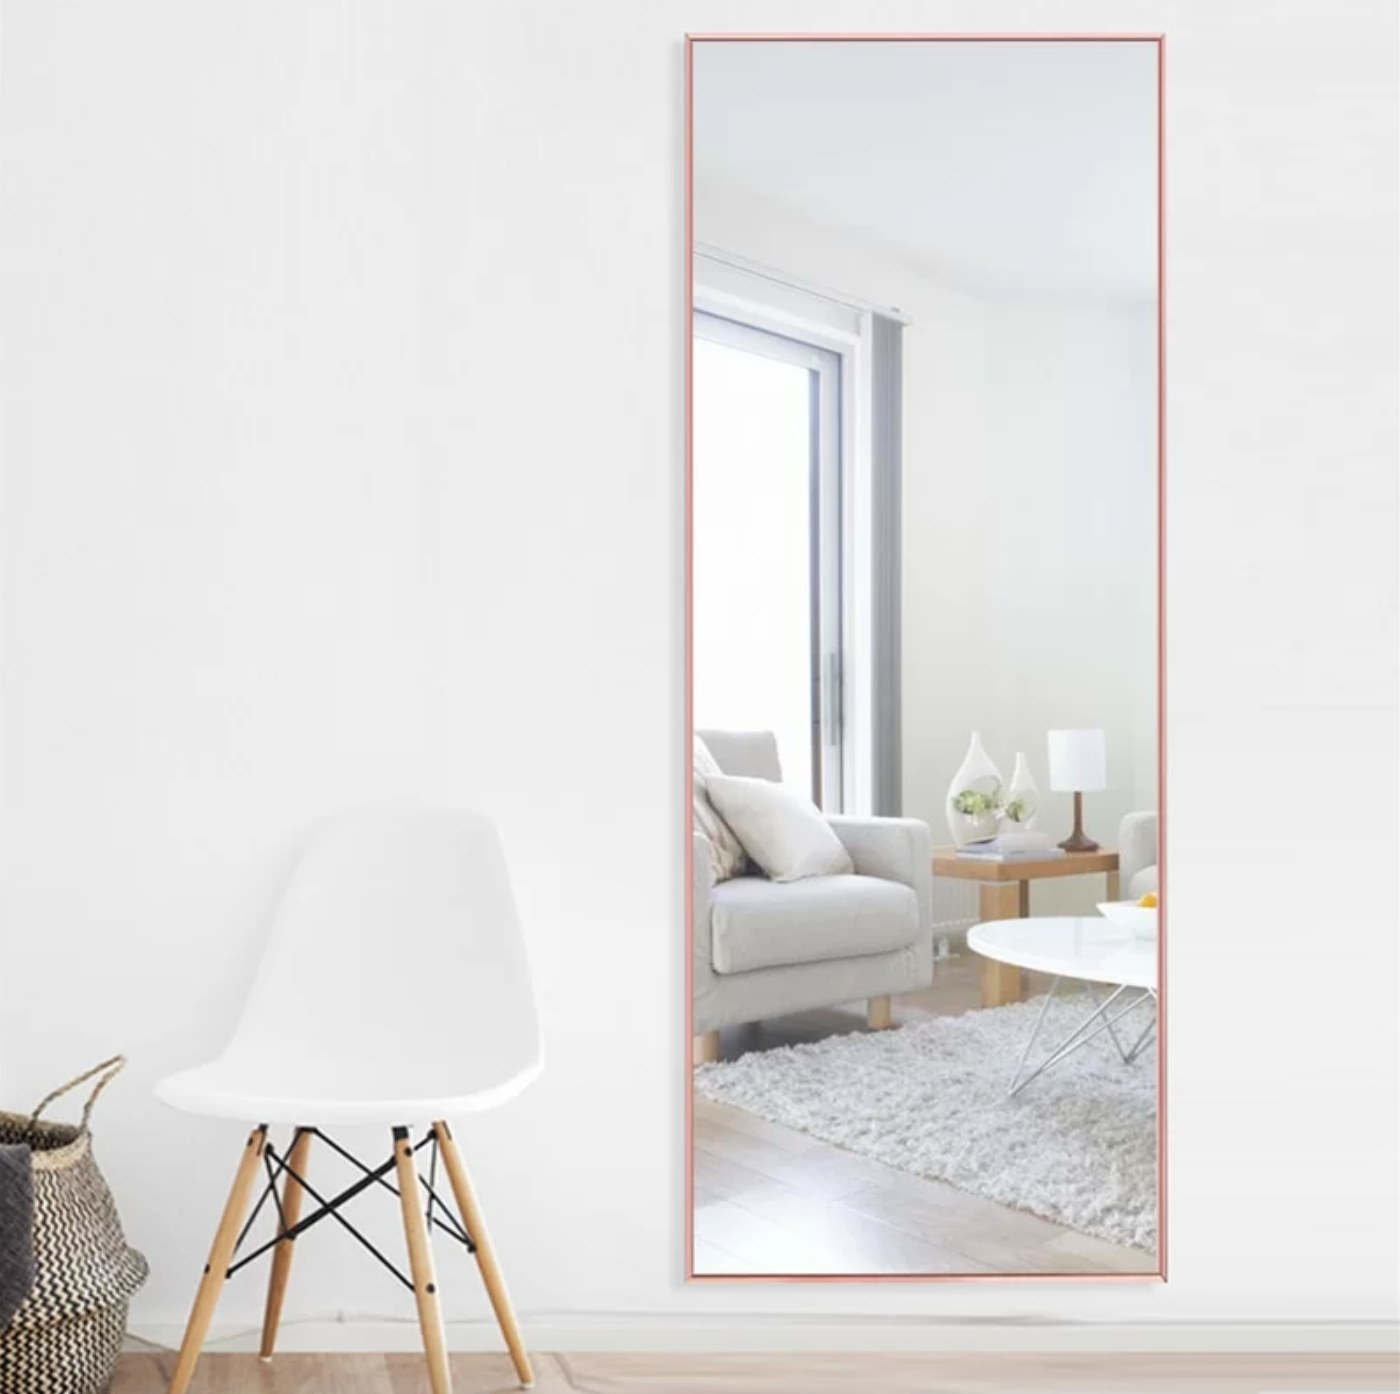 The full-length mirror in peach